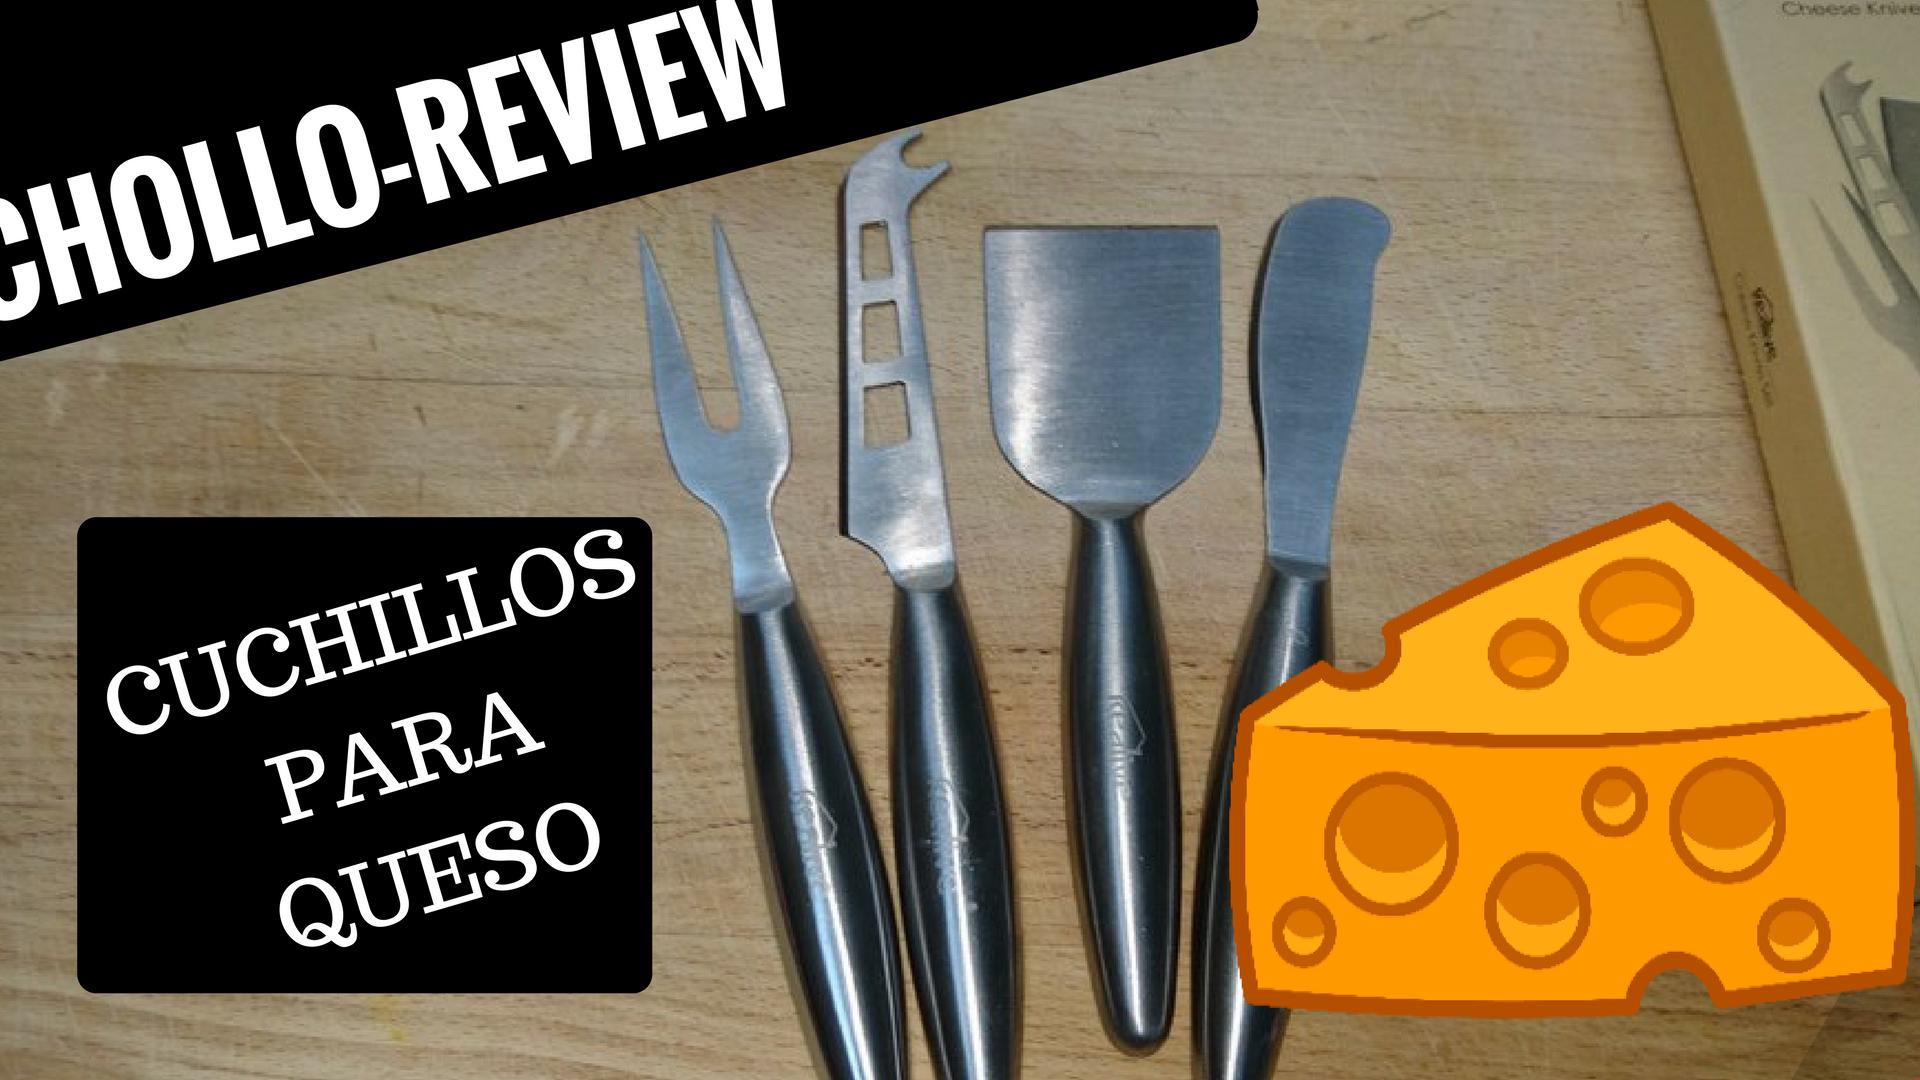 Super kit de cuchillos para cortar queso chollo review - Cuchillo cortar queso ...